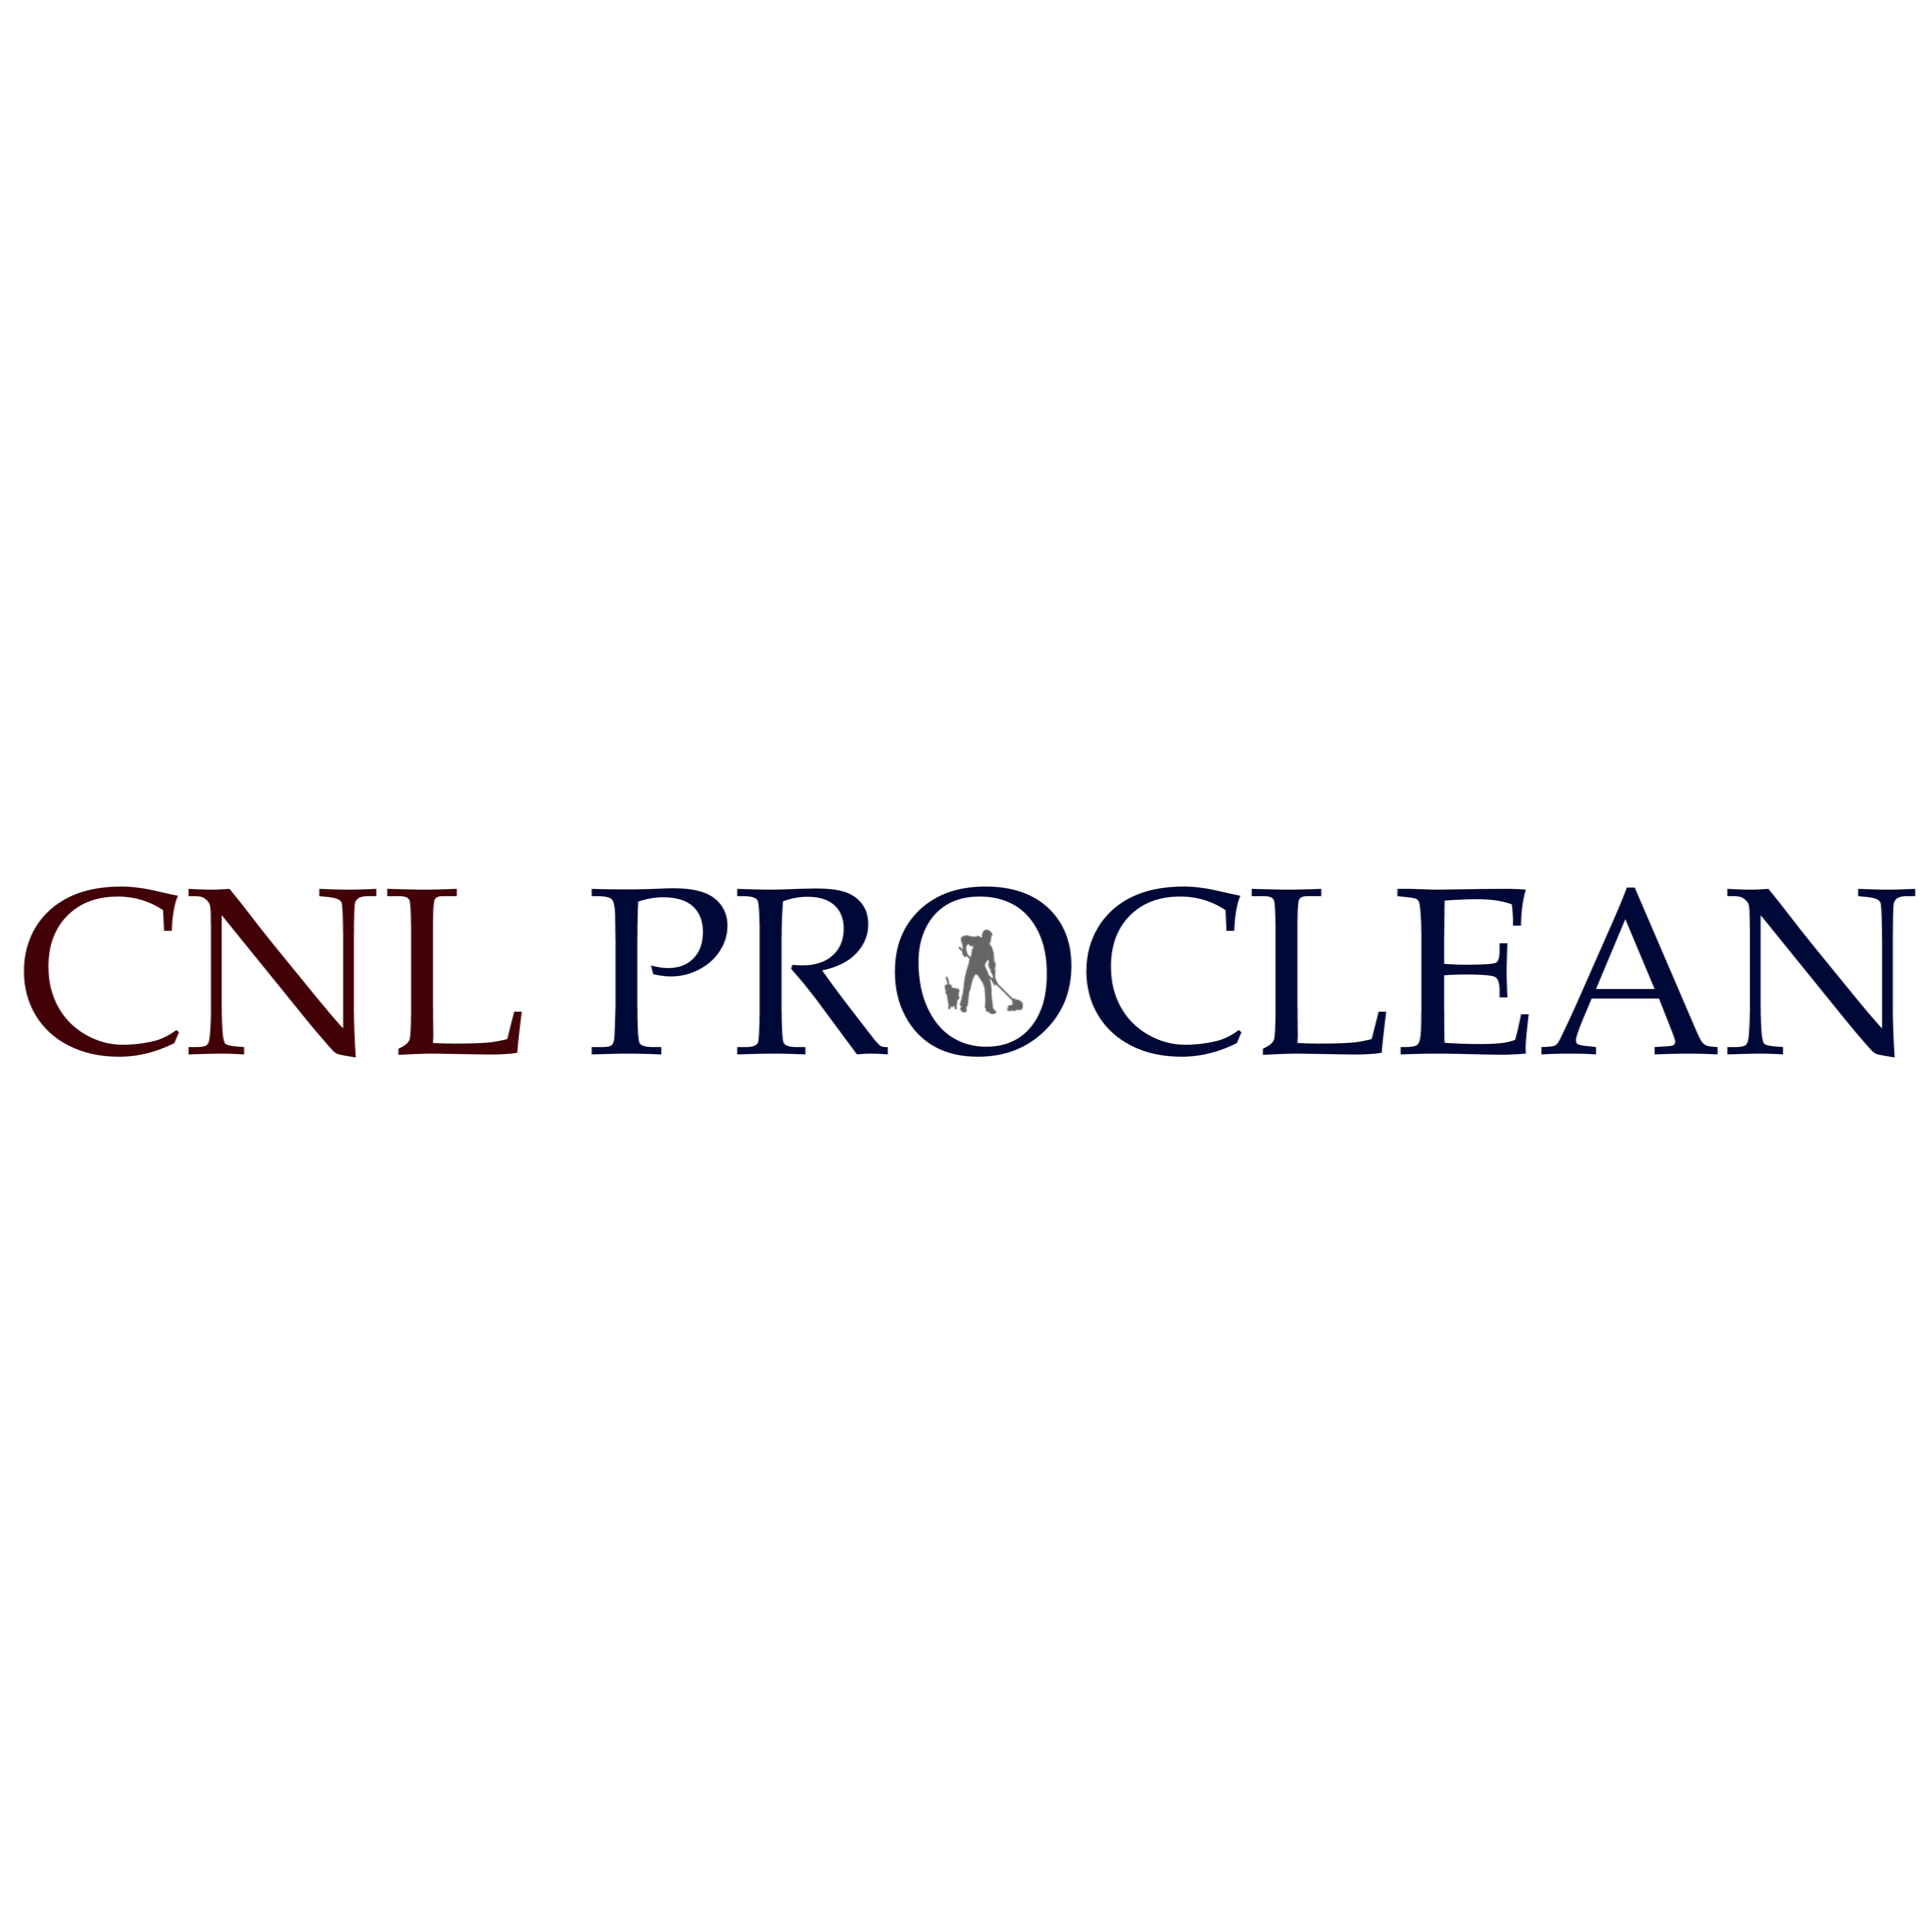 CNL PROCLEAN